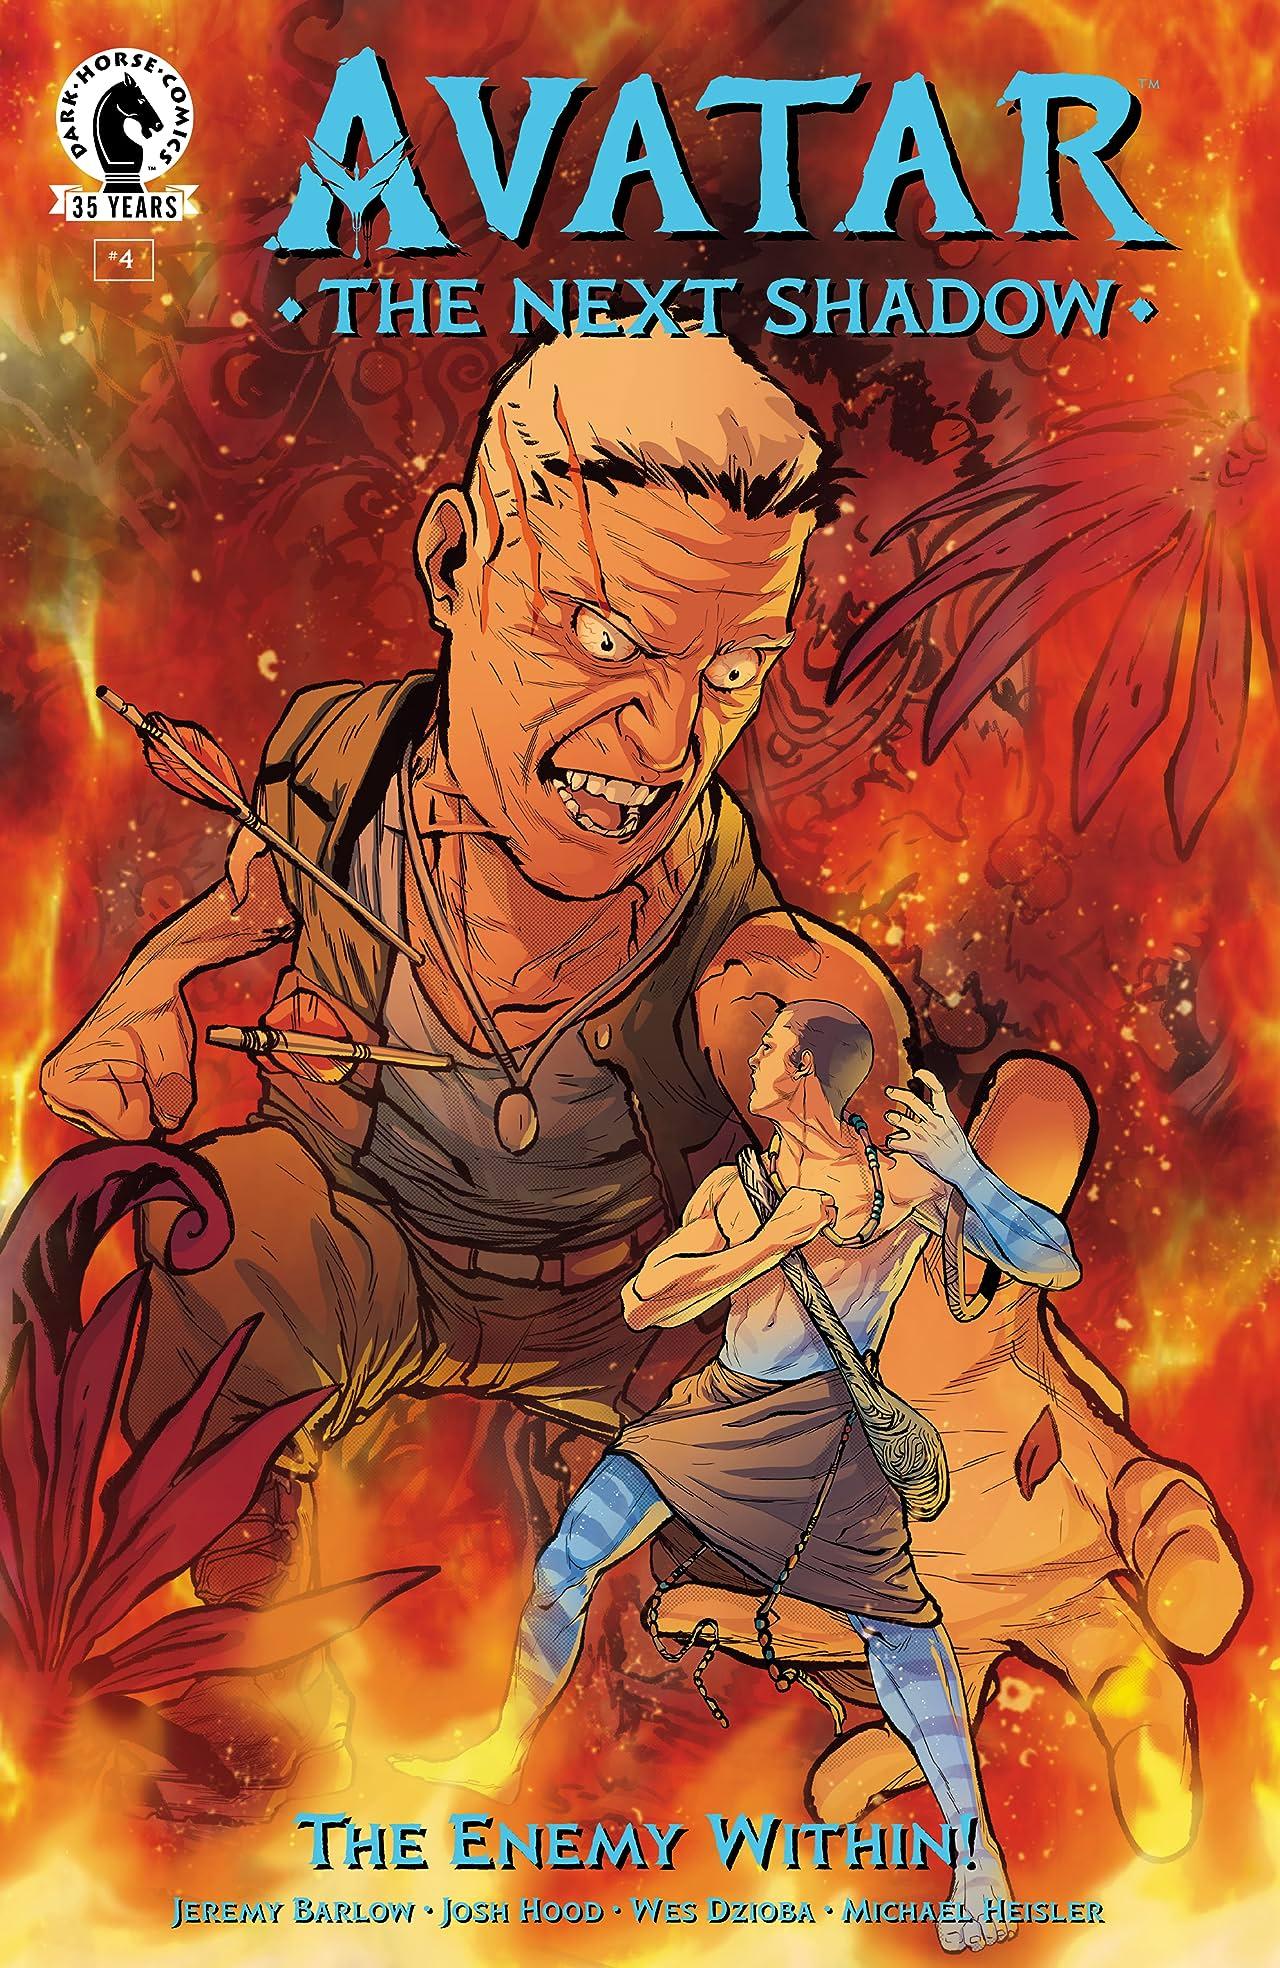 Avatar: The Next Shadow #4